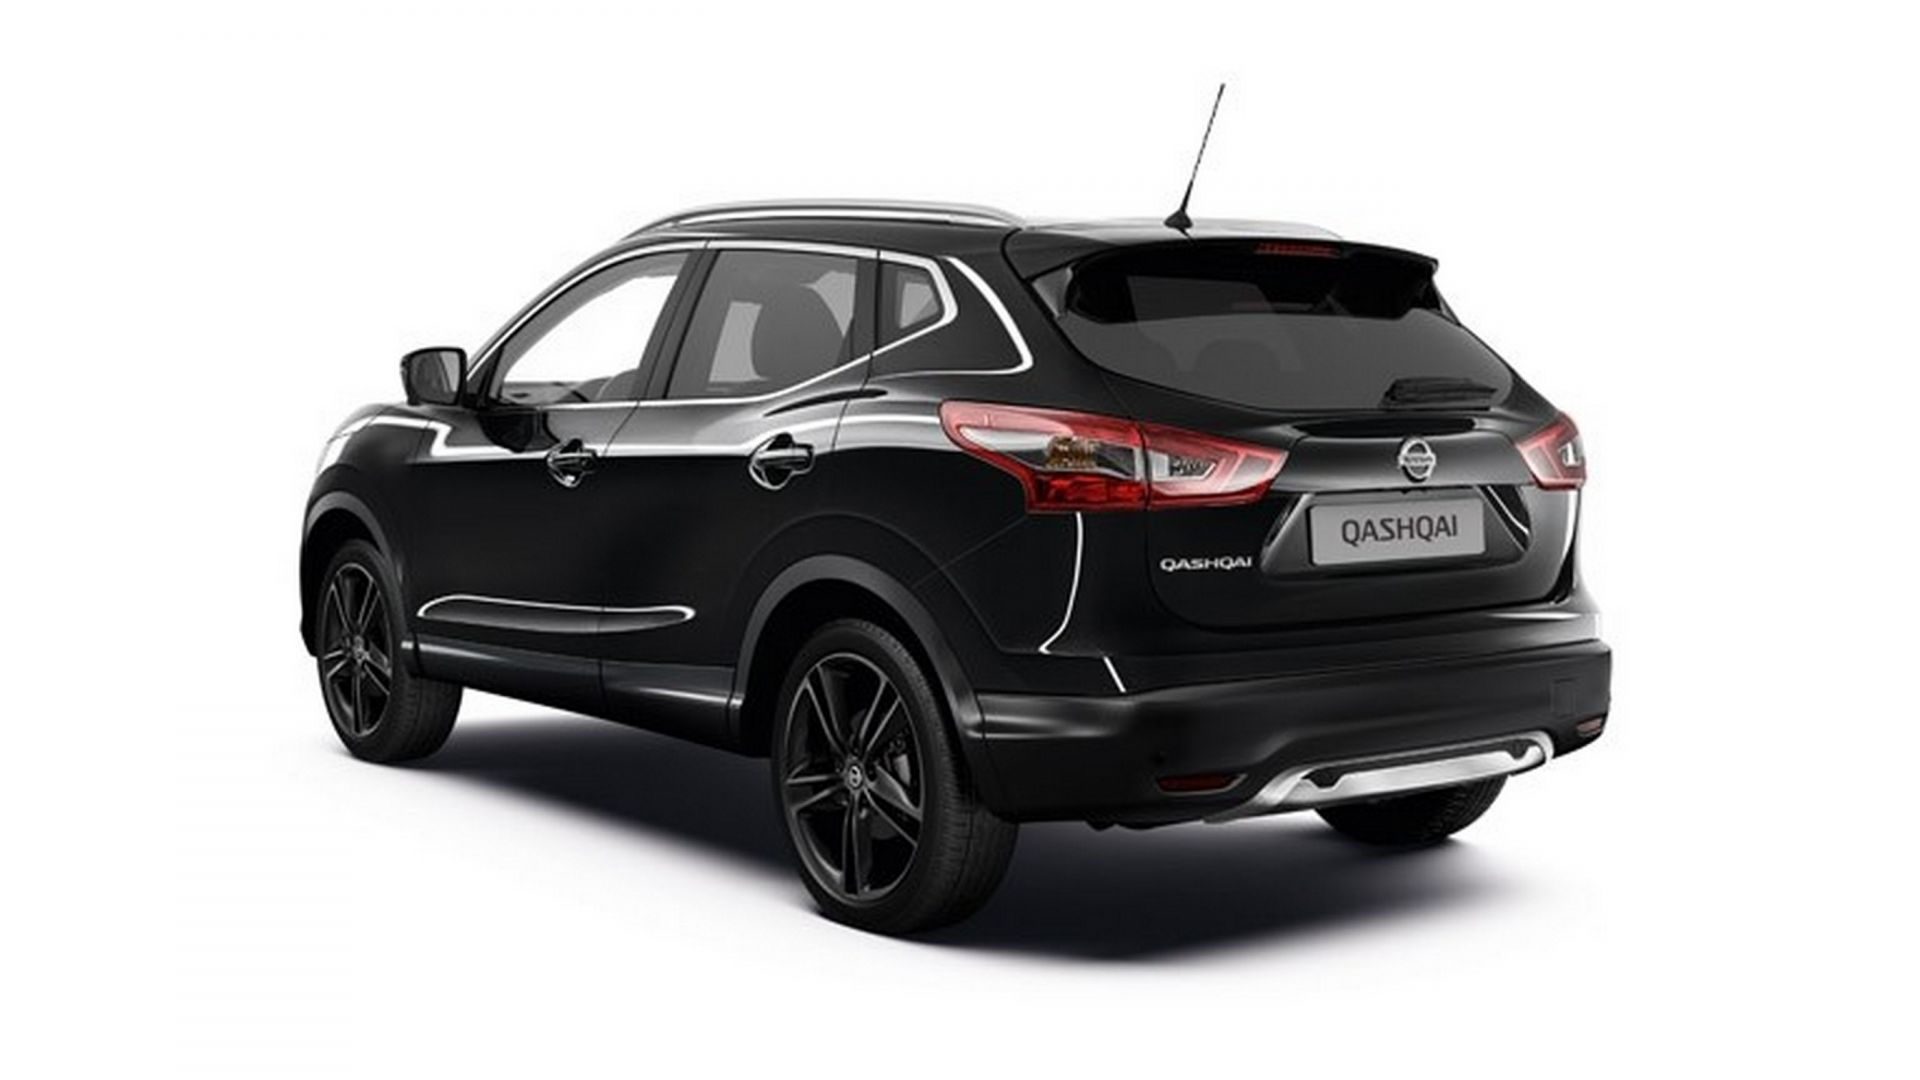 Edizioni Limitate Nissan Qashqai Black Edition Motorbox